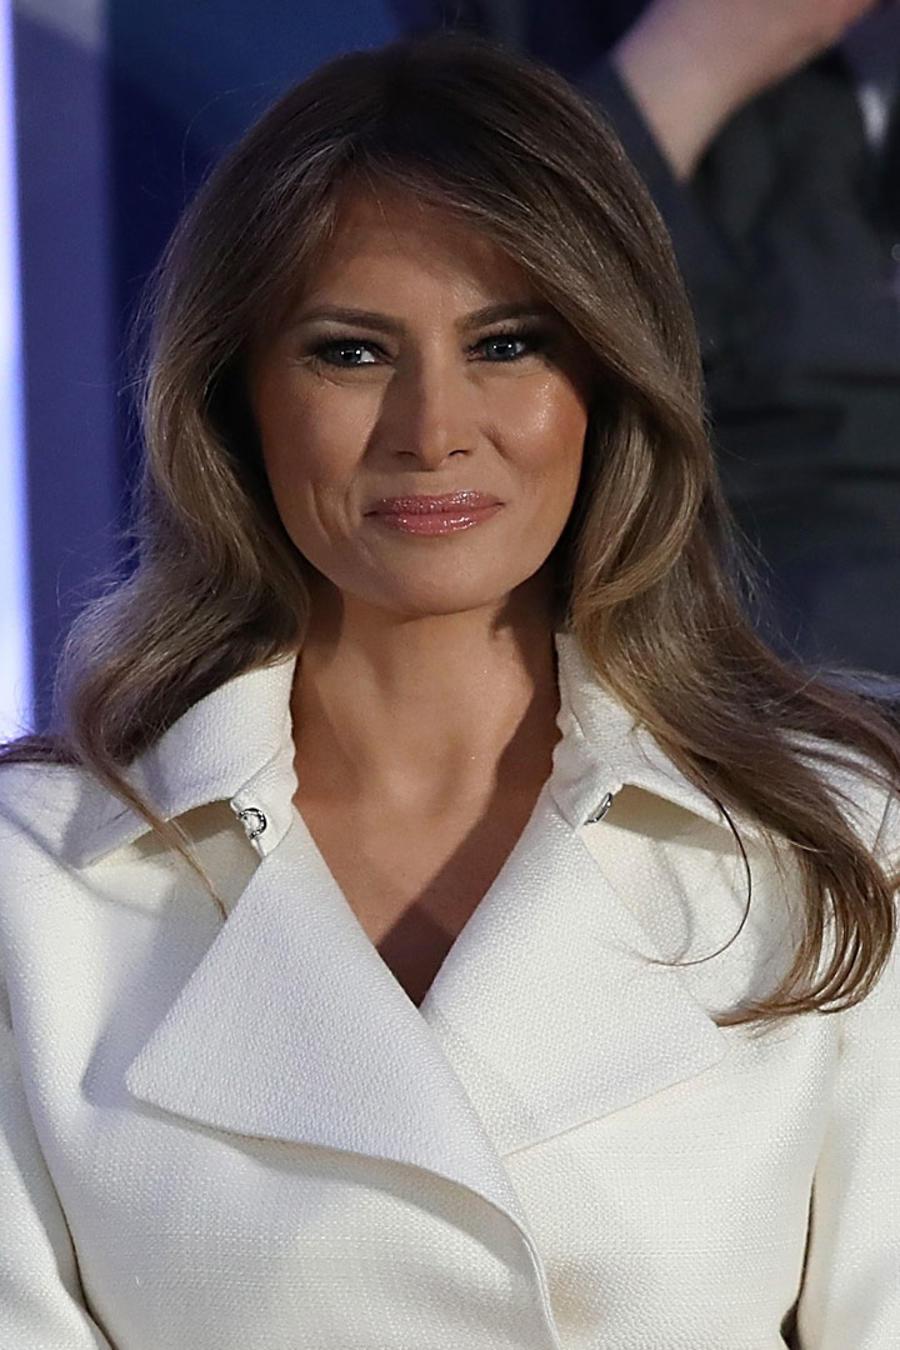 Melania Trump sonriendo